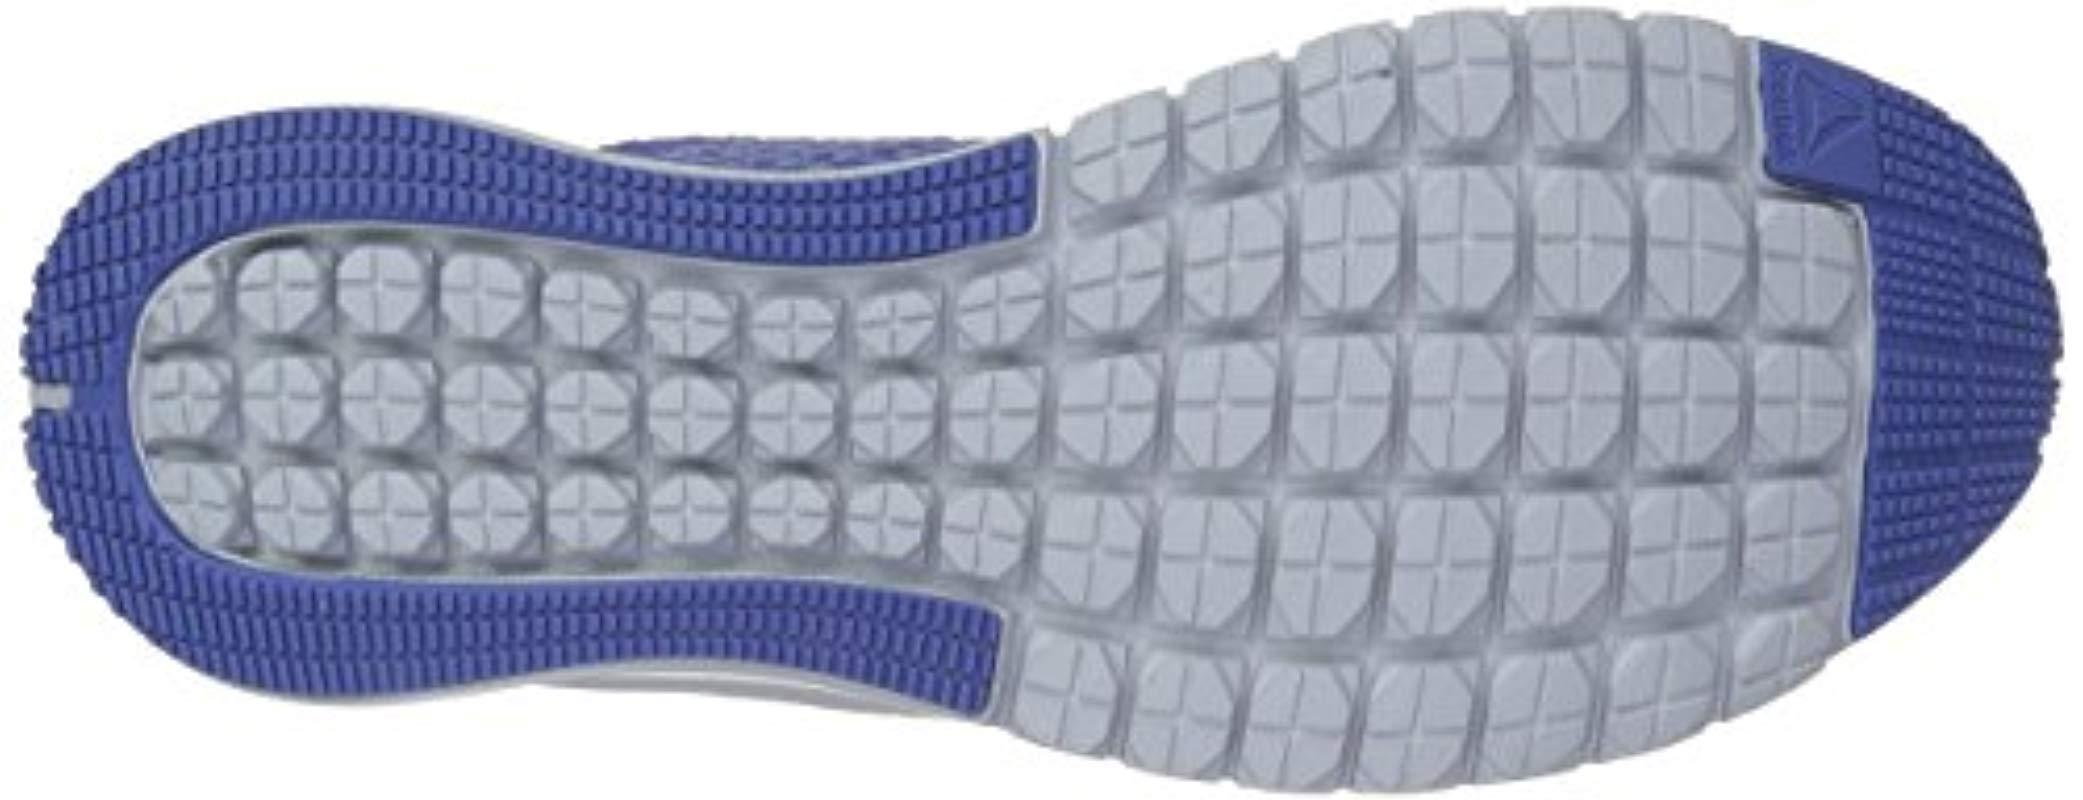 Reebok Print Athlux Weave Sneaker in Blue